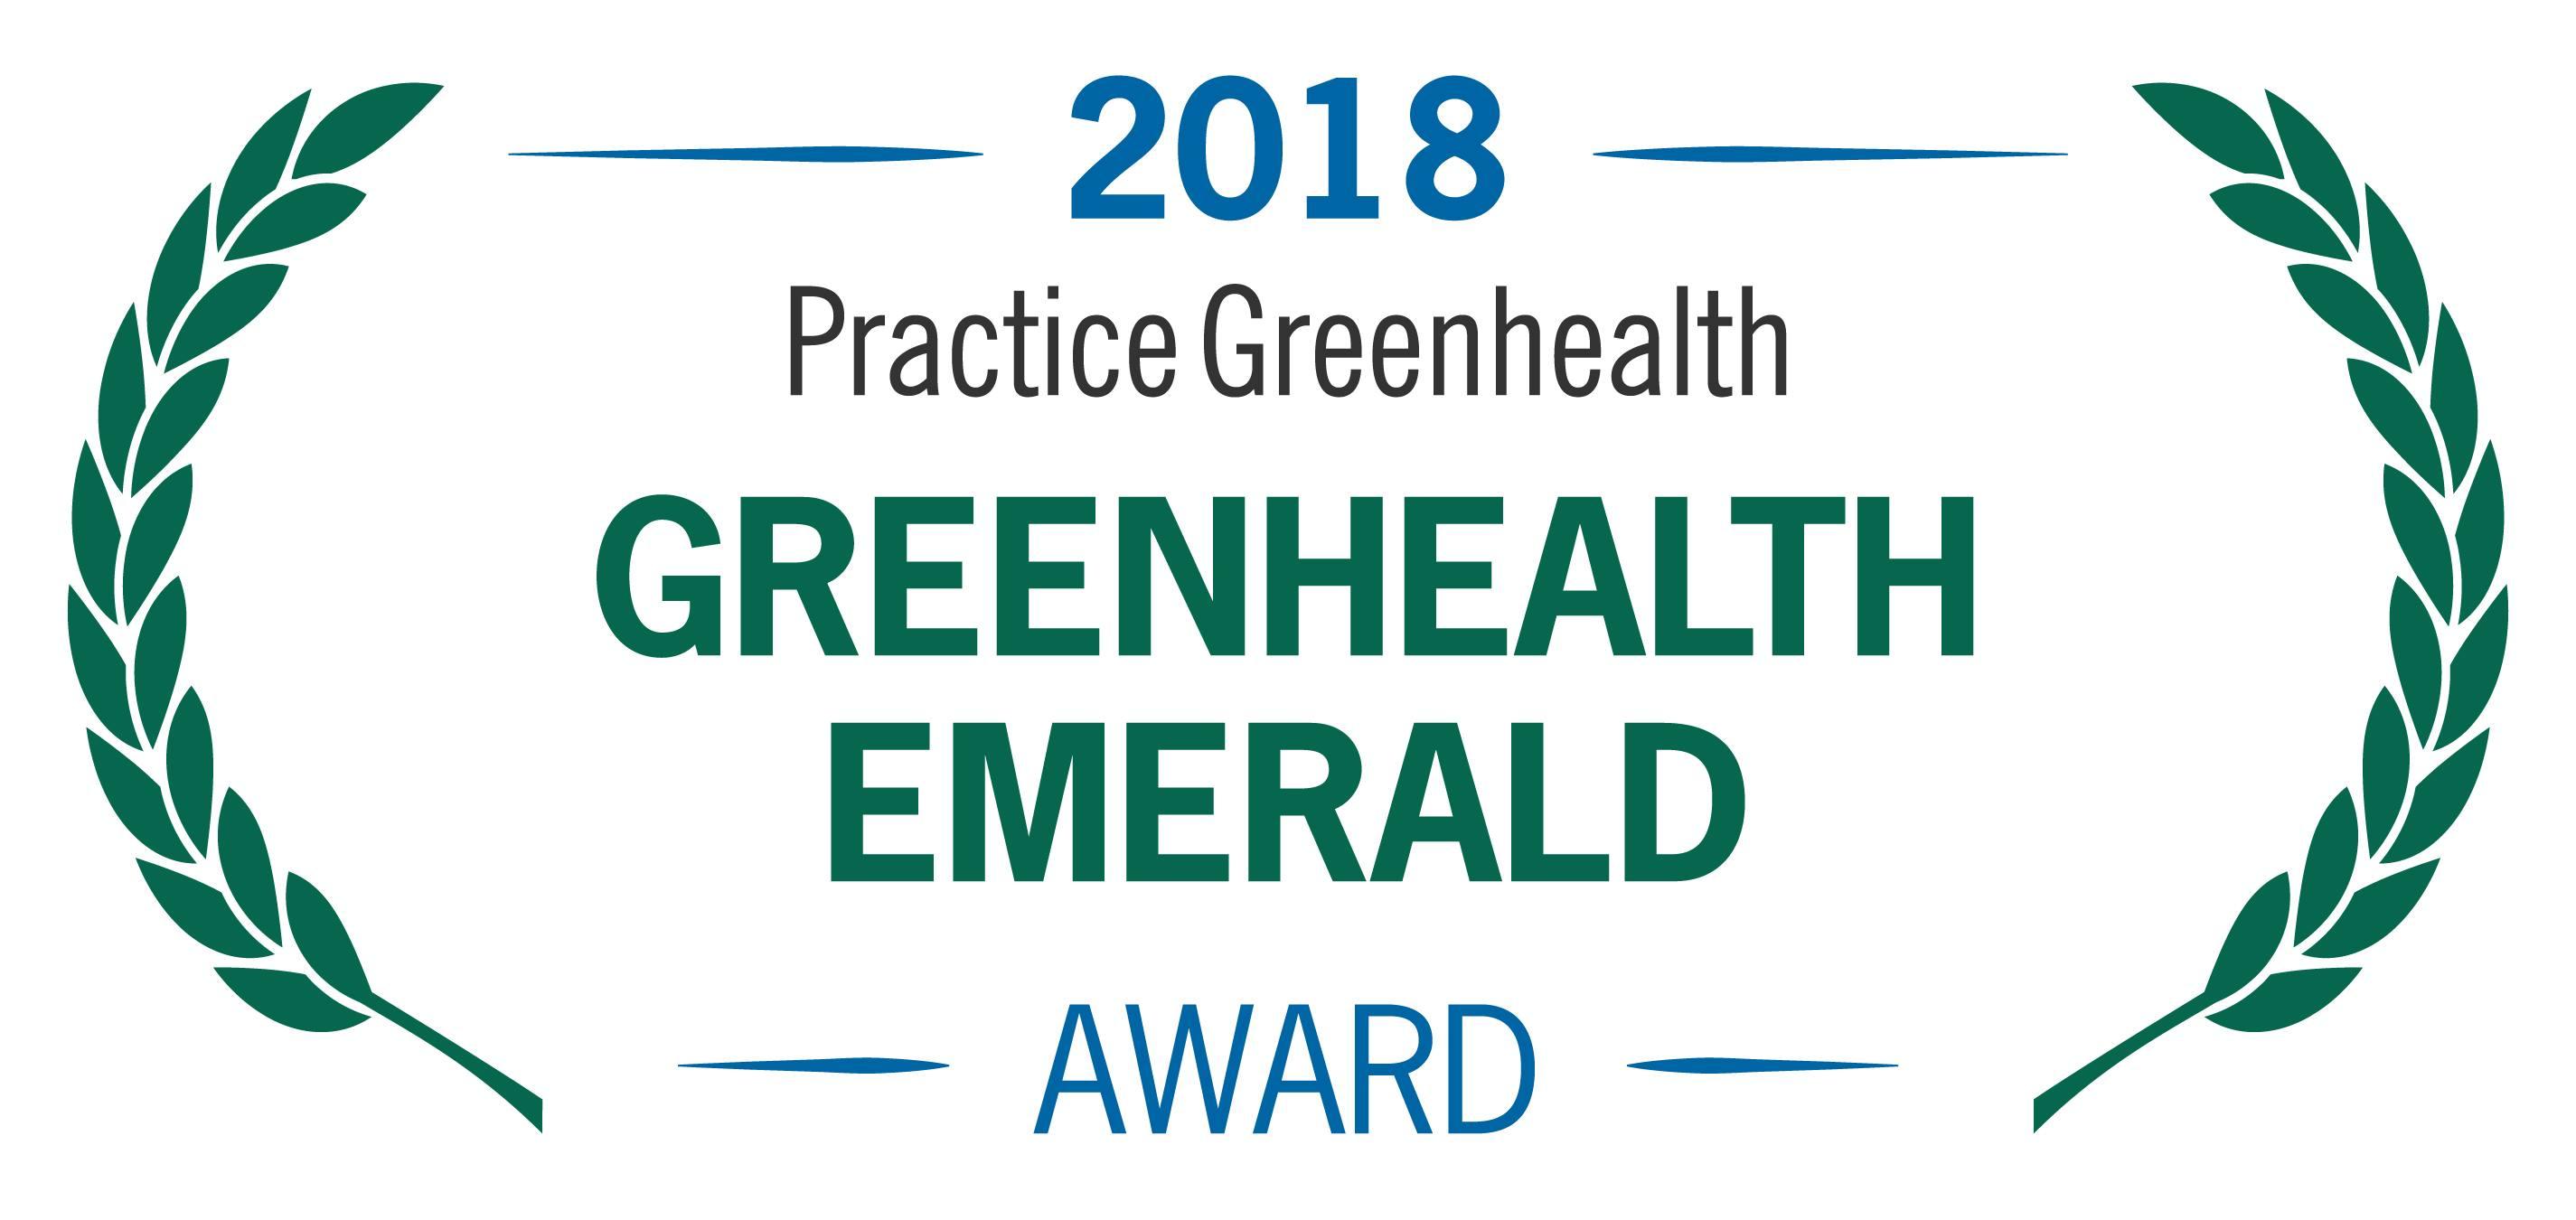 2018 Practice Greenhealth Emerald Award